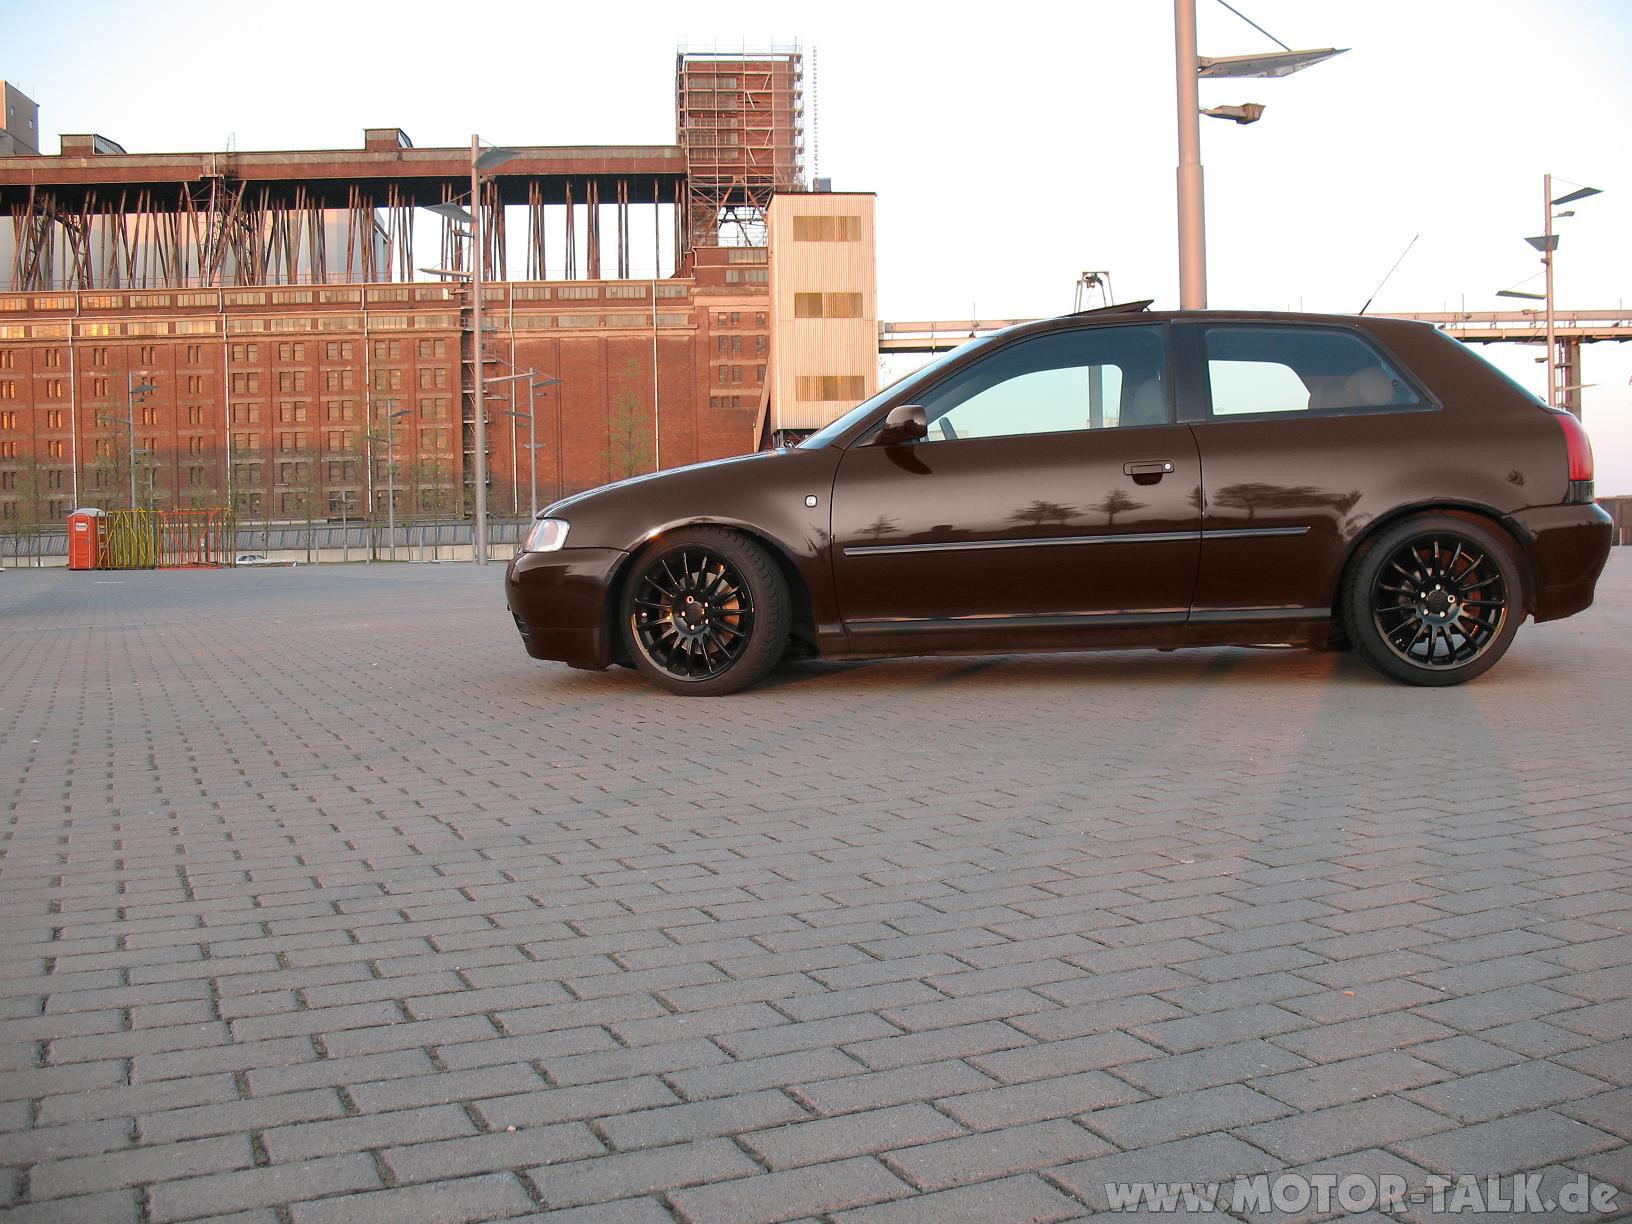 Entwurf Braun Zeigt Mal Eure Audis Her Audi A3 8l